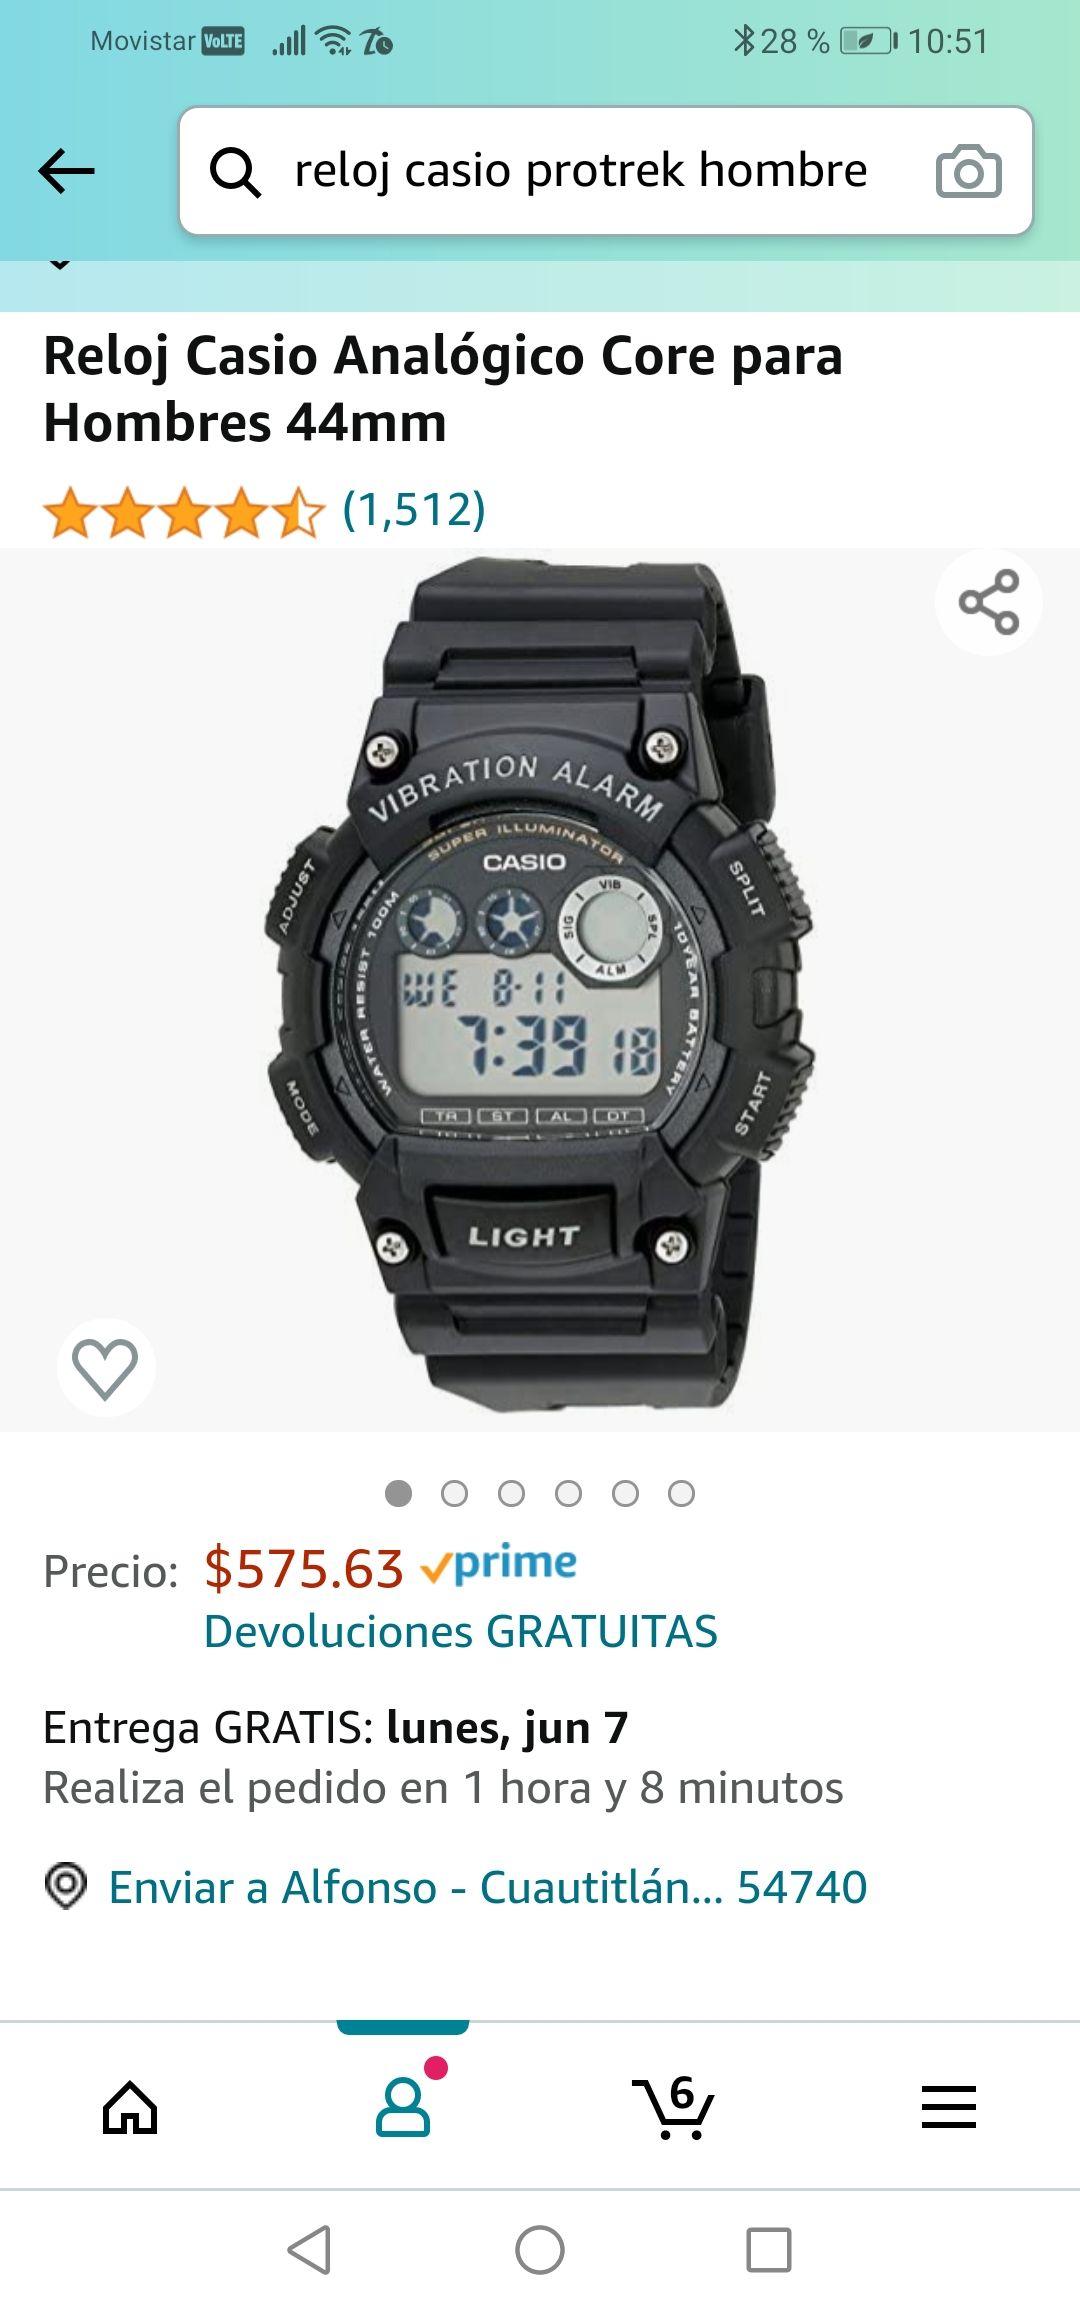 Amazon : Casio con Alarma de vibracion